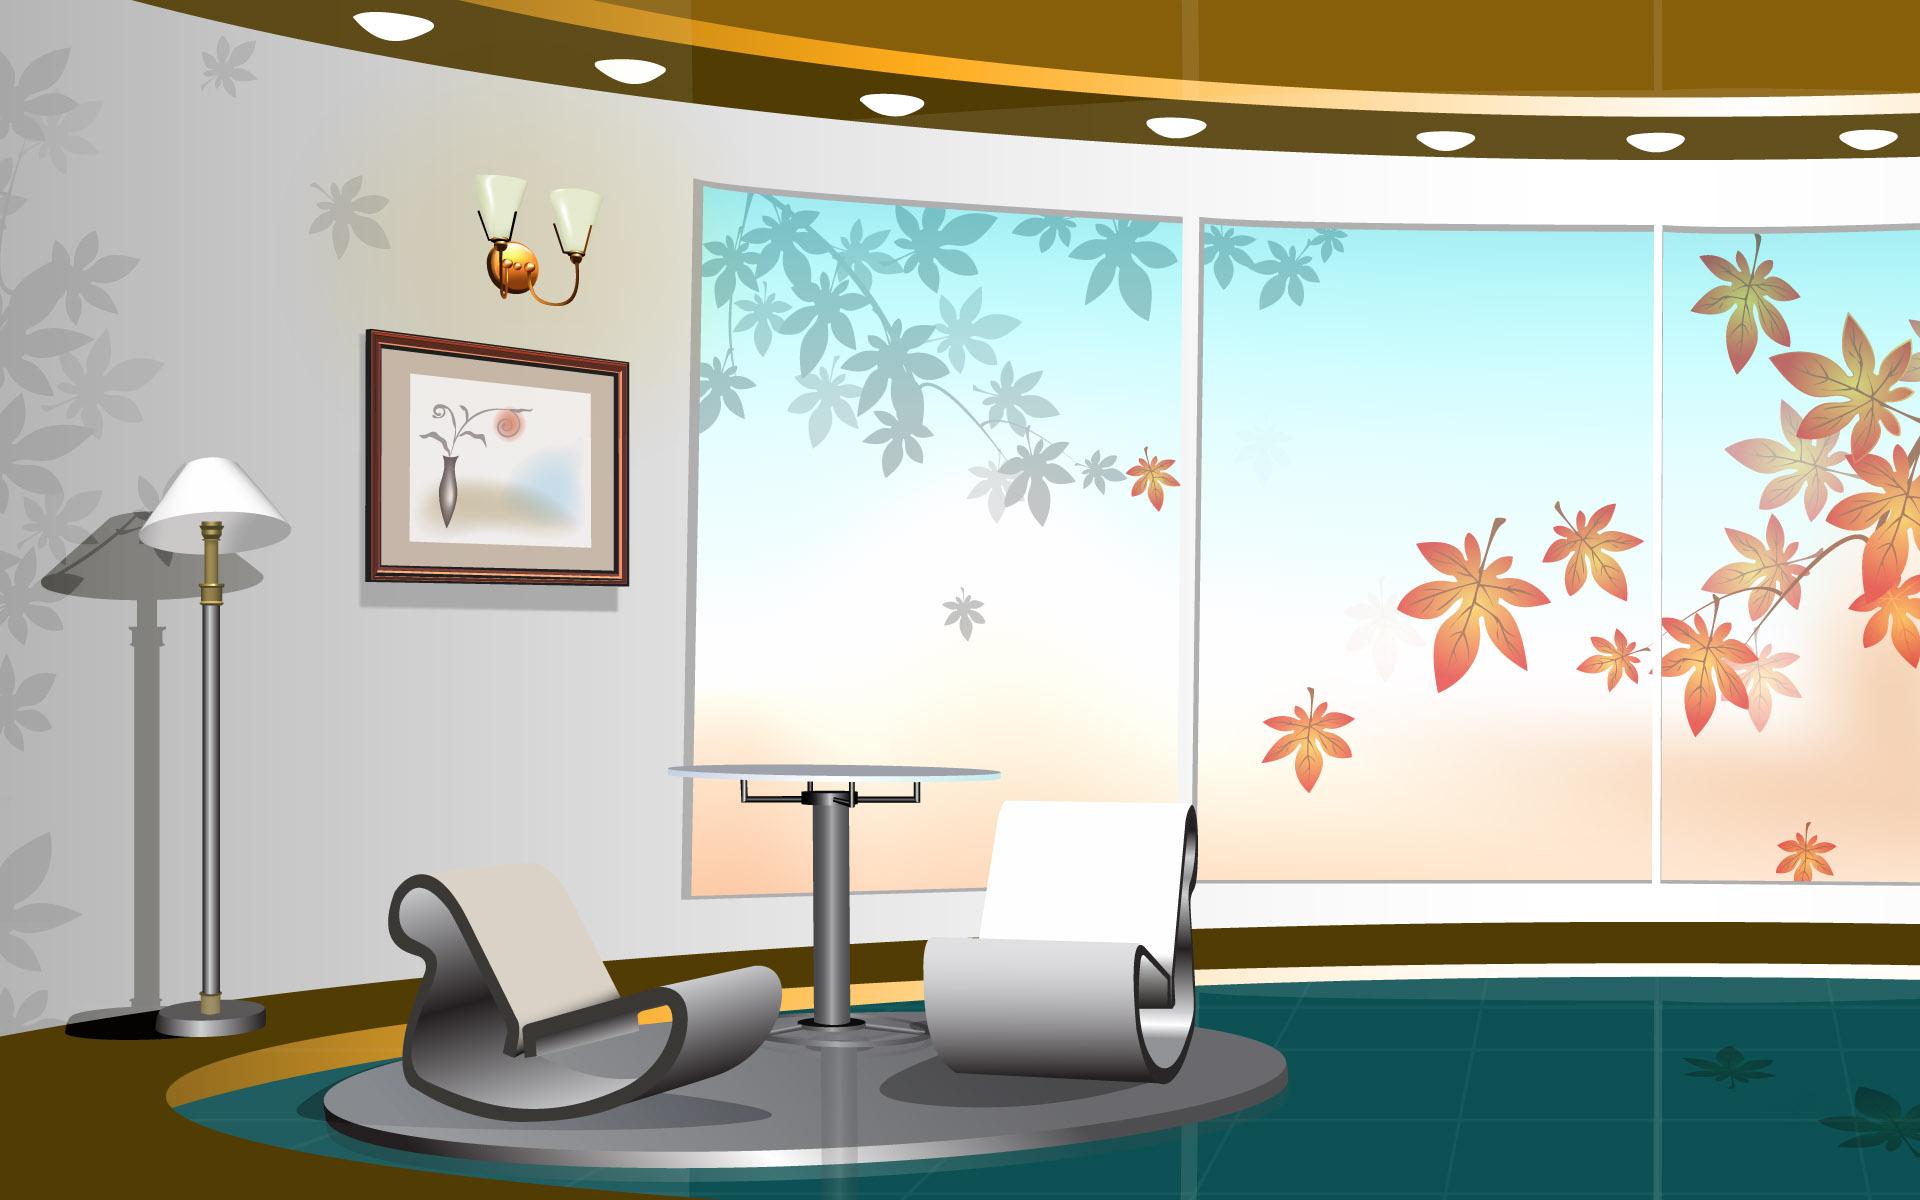 High Resolution Wallpaper | Interior Art Design  1920x1200 px